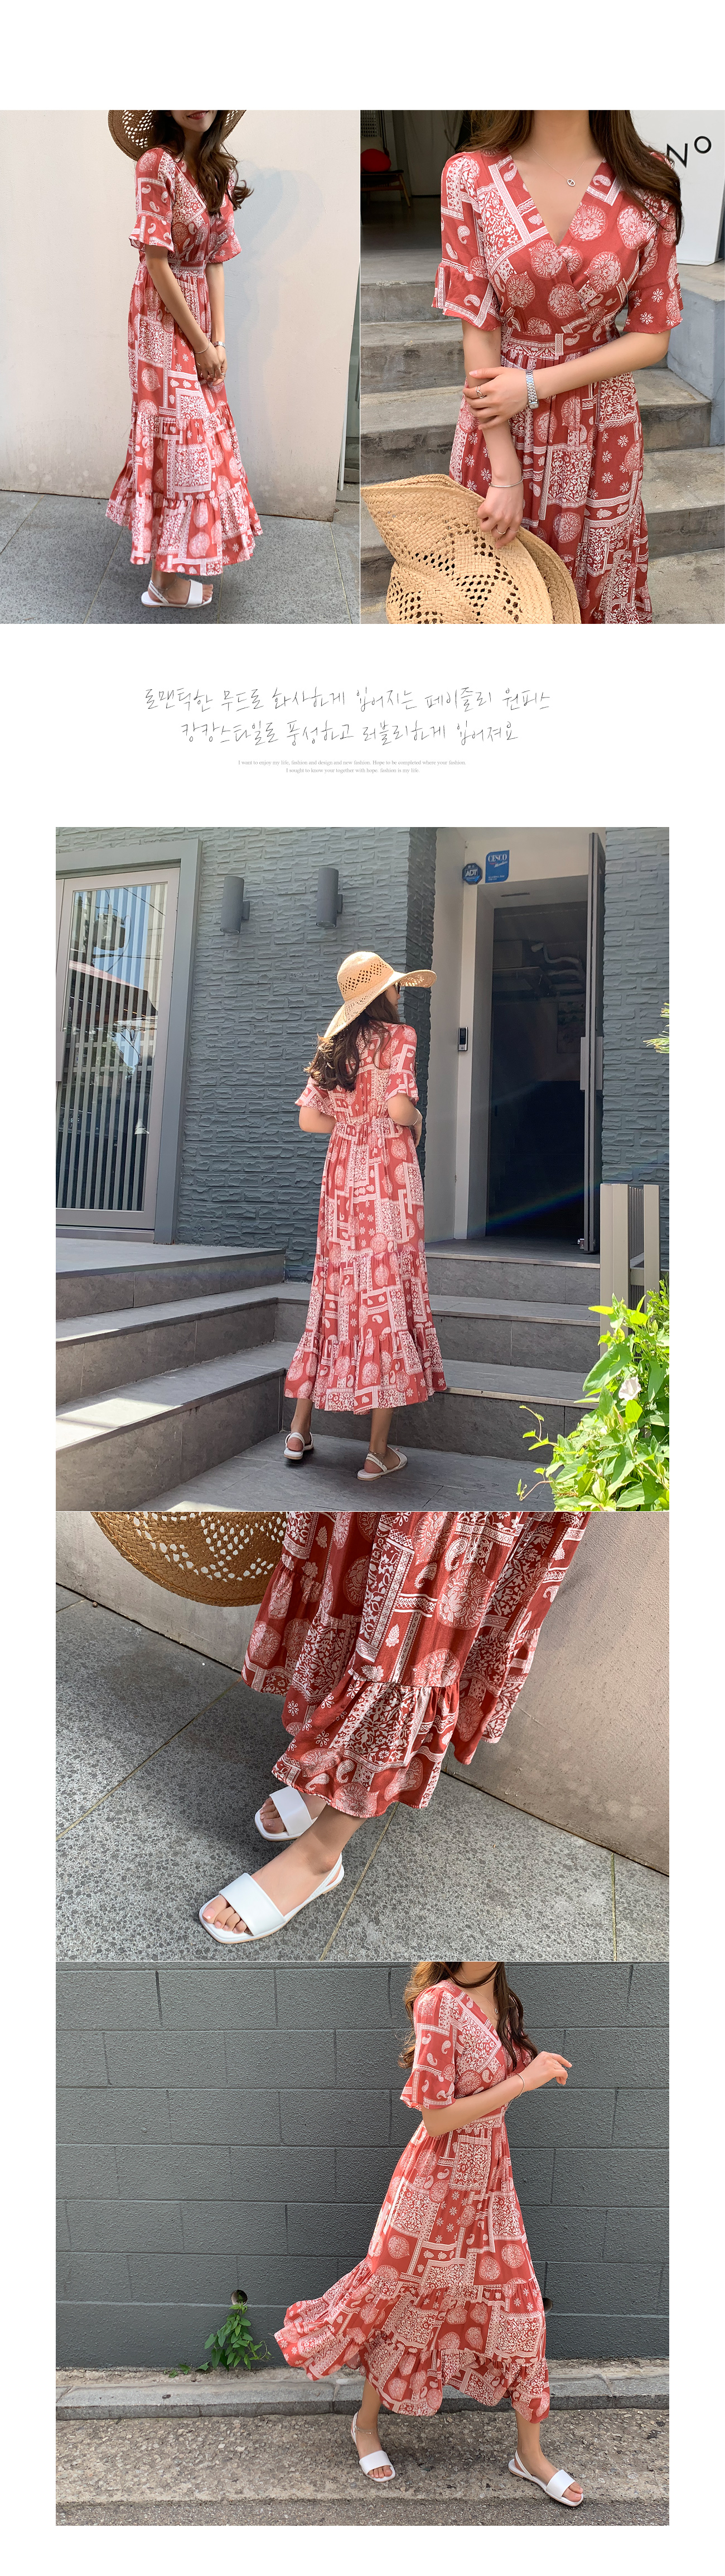 Paisley V Neck Dress #37531